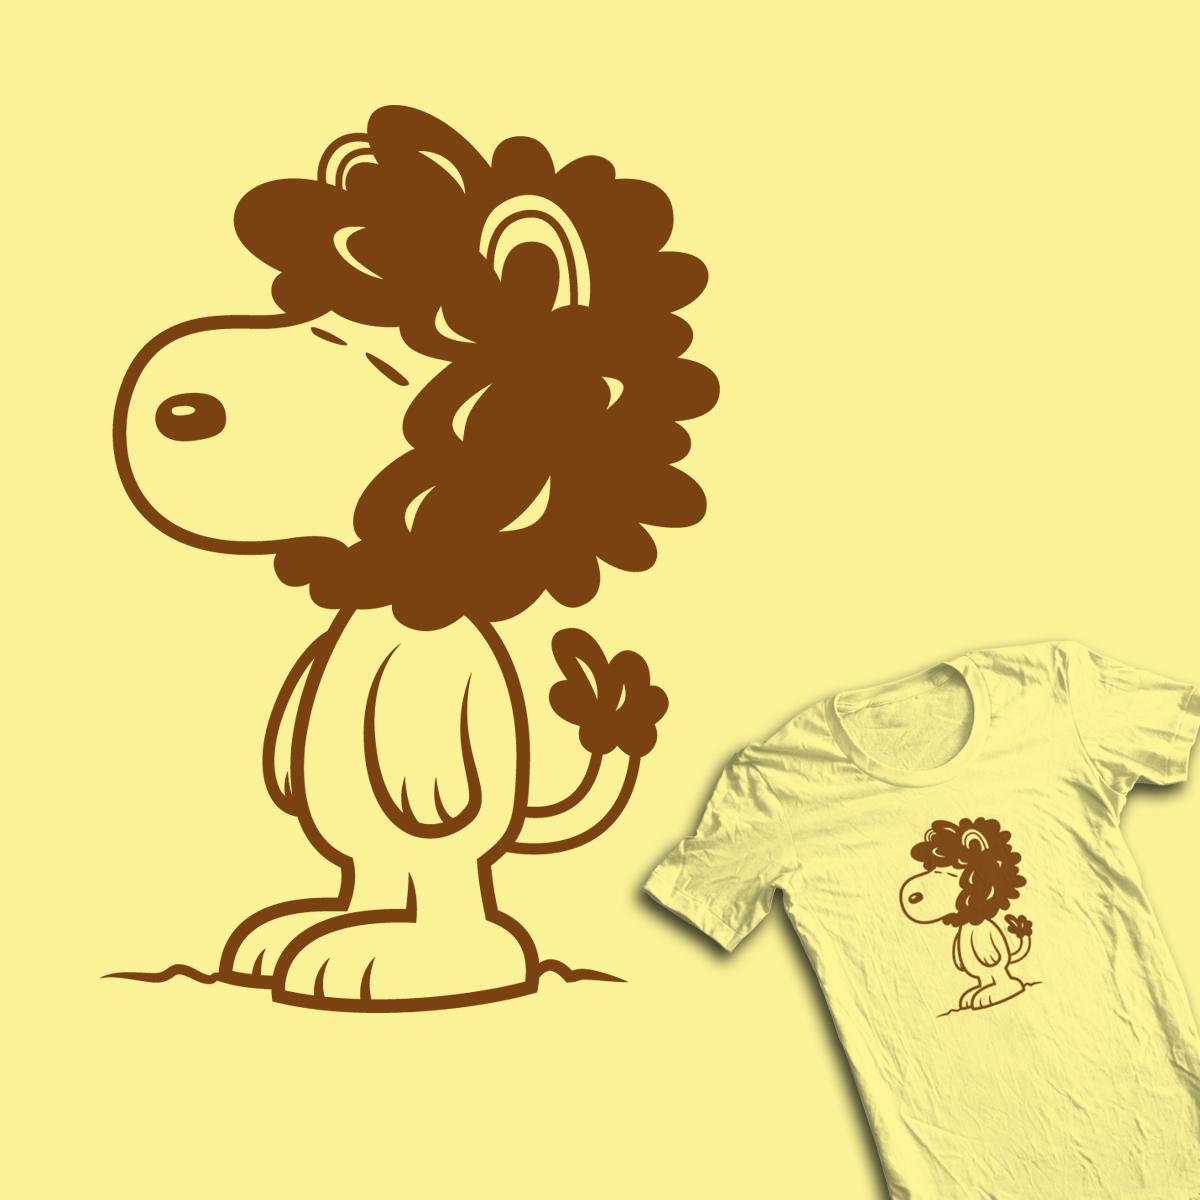 Isnoop Lion  by krisren28 on Threadless